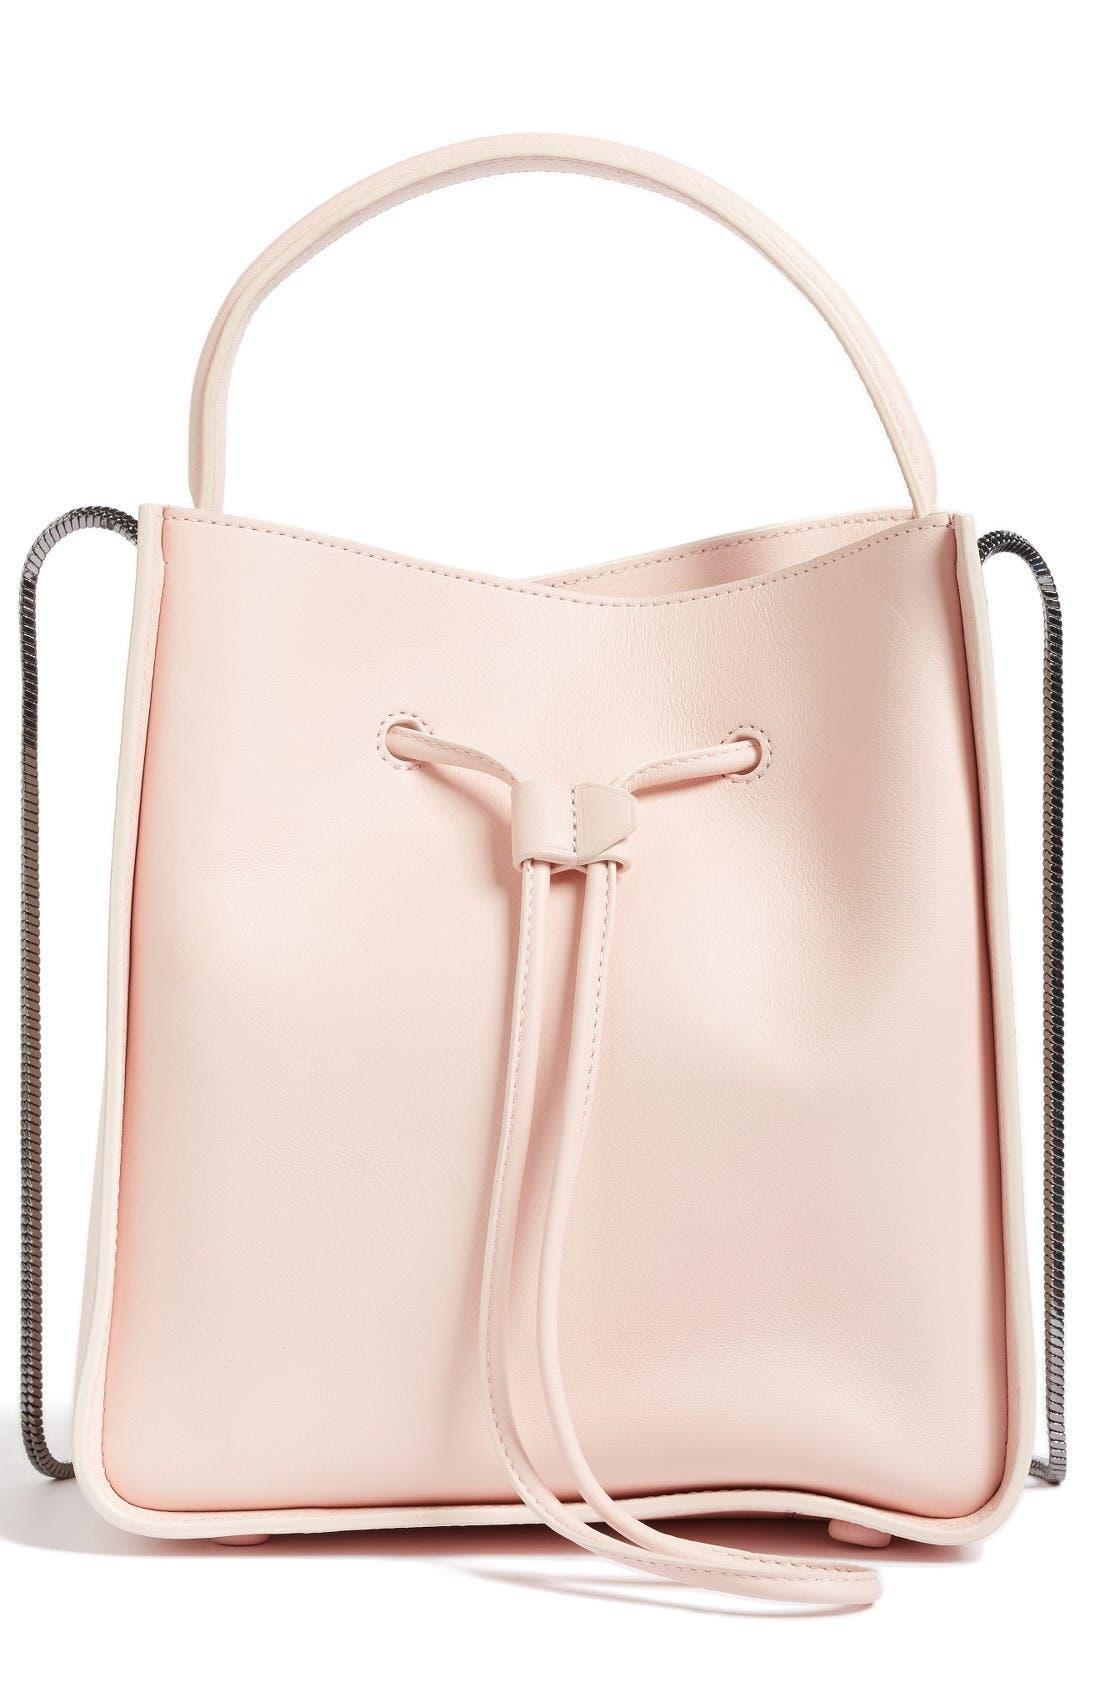 Mini Soleil Leather Bucket Bag,                             Main thumbnail 1, color,                             Light Pink